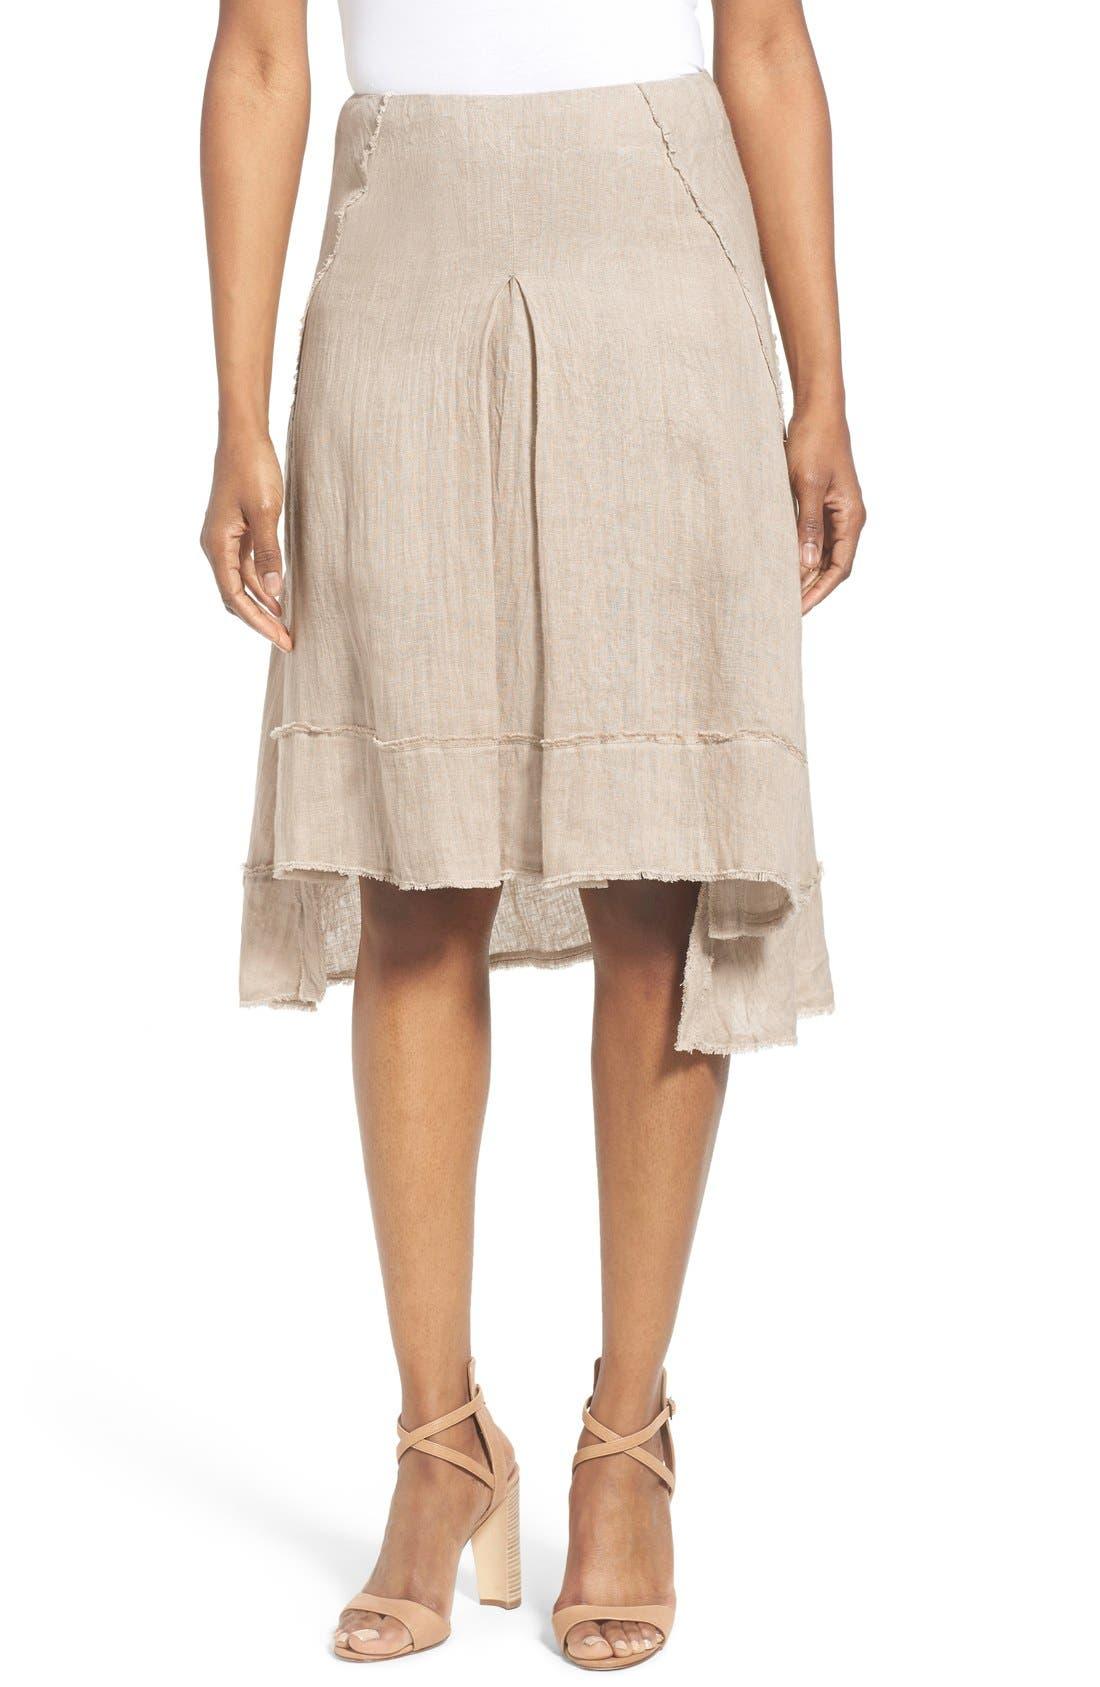 Alternate Image 1 Selected - Elie Tahari 'Florence' High/Low Linen Skirt